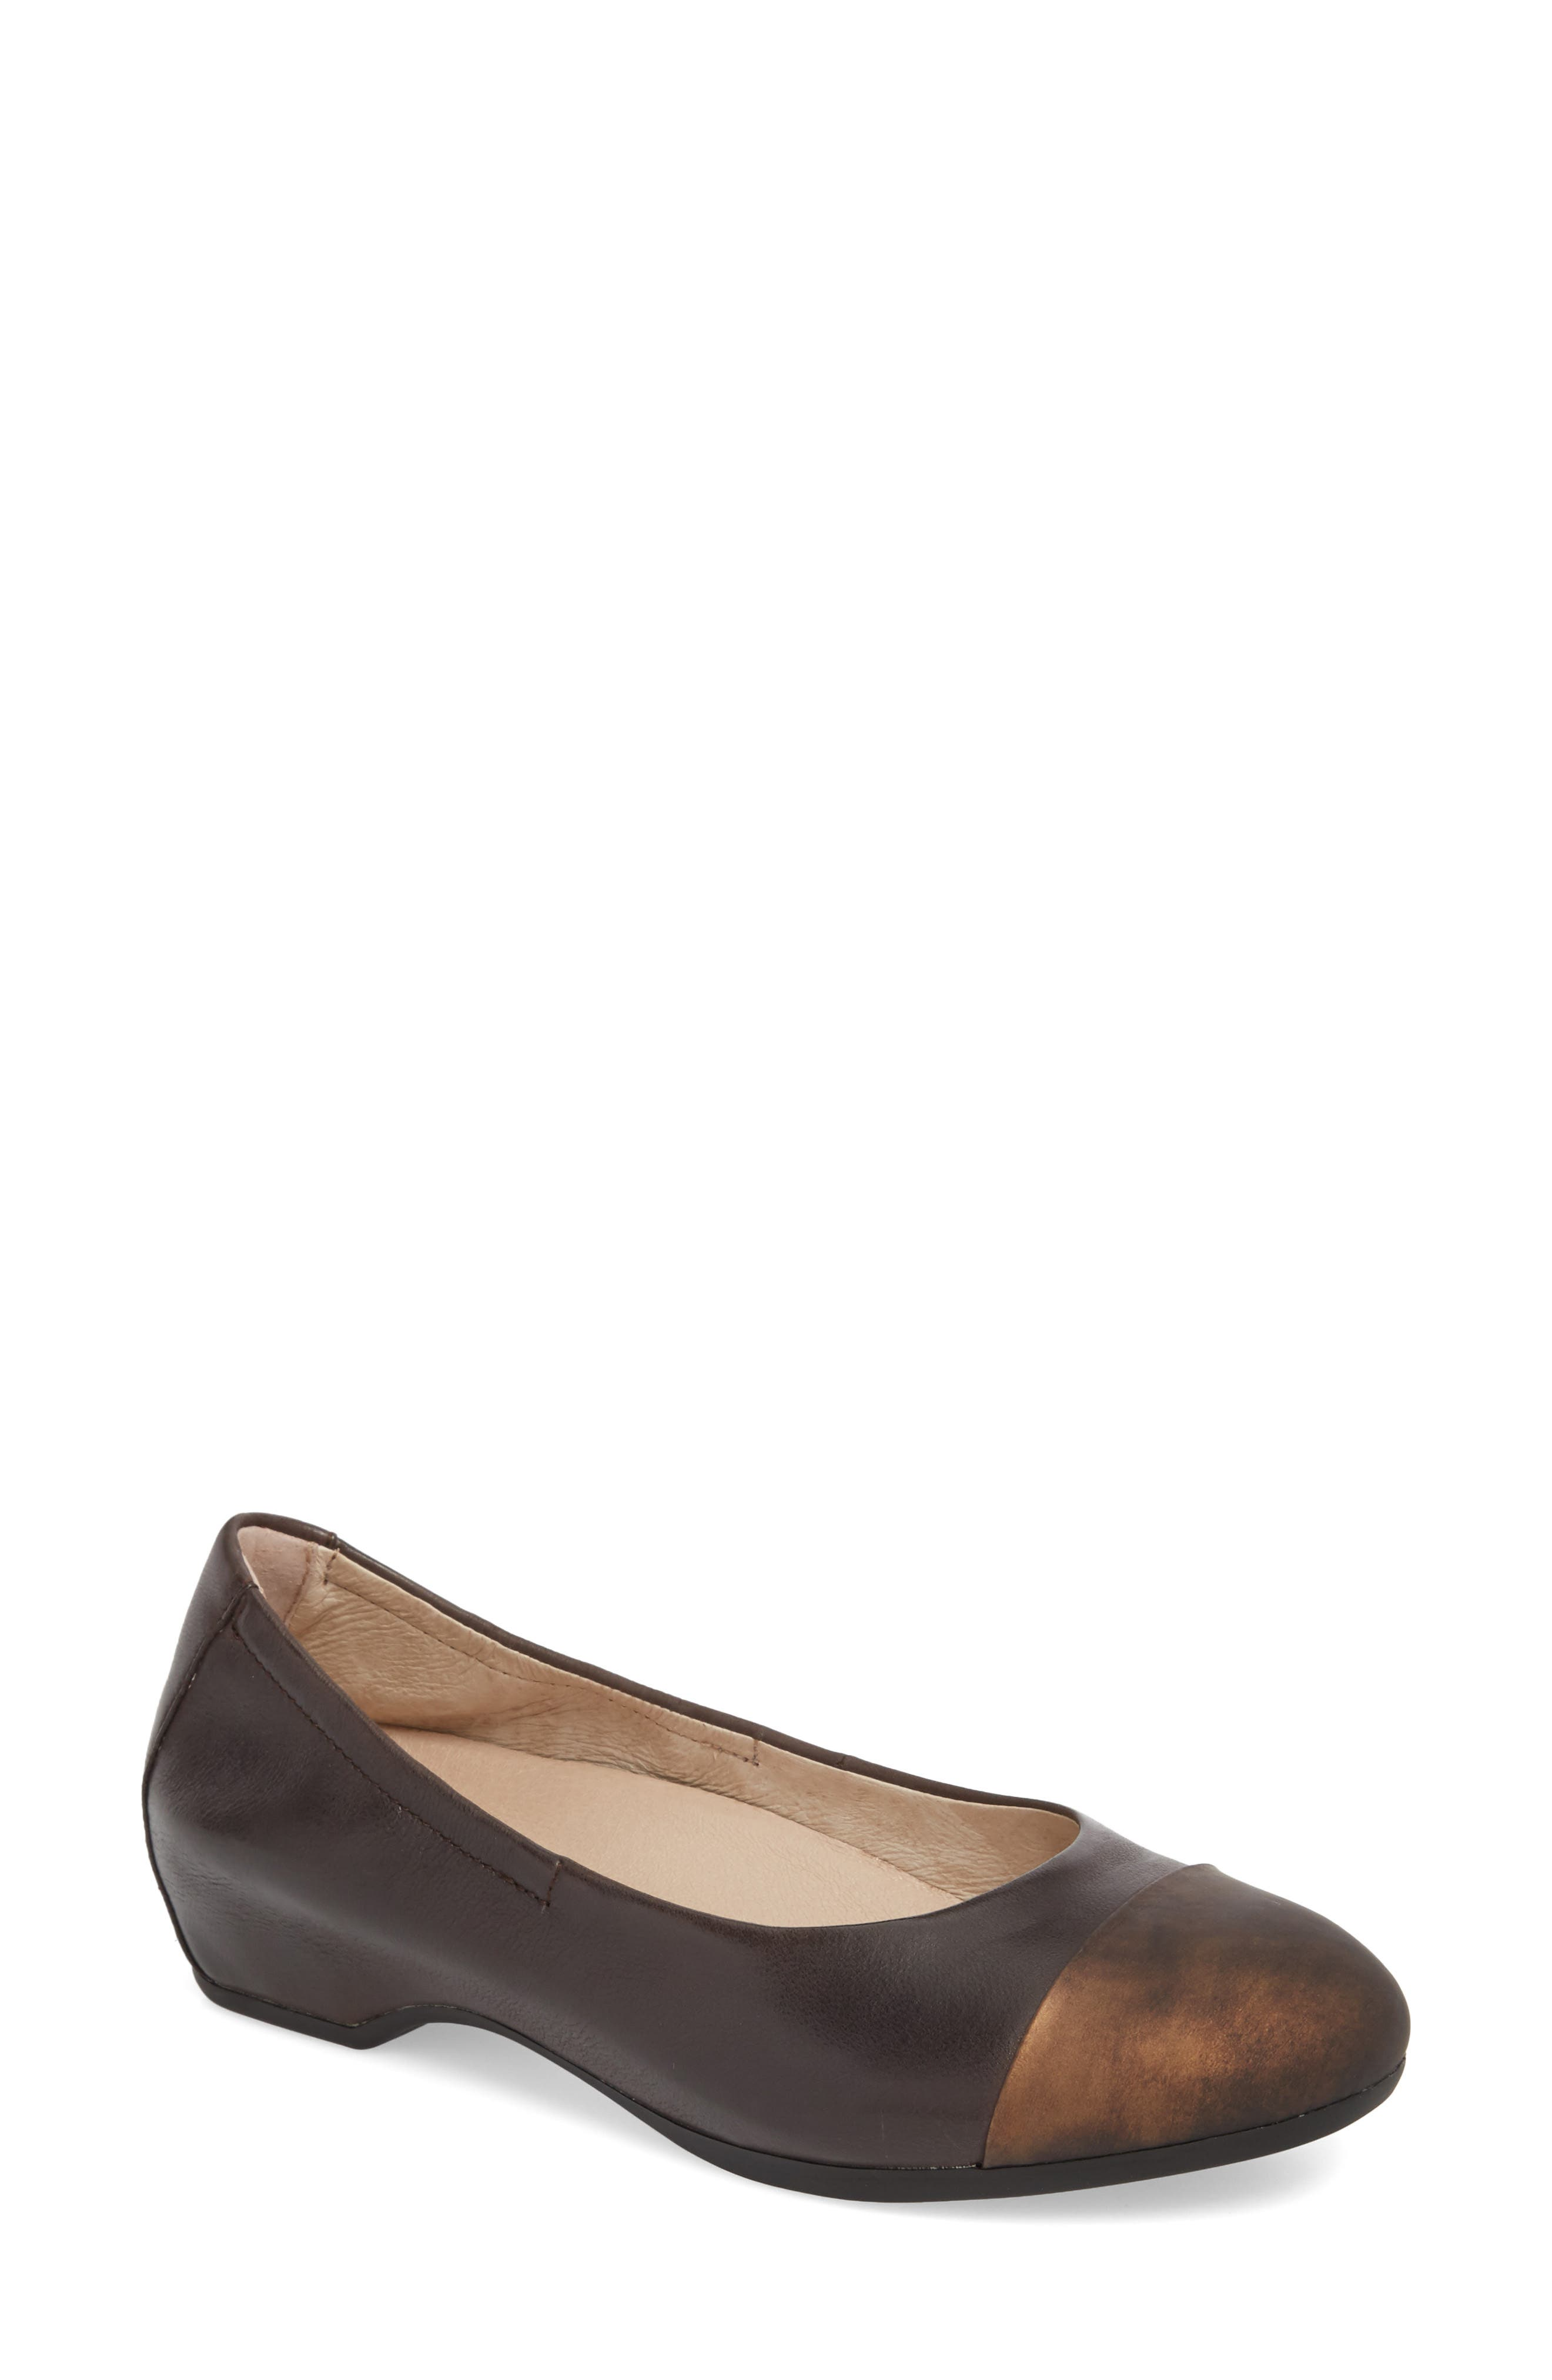 Dansko Lisanne Flat-6- Brown